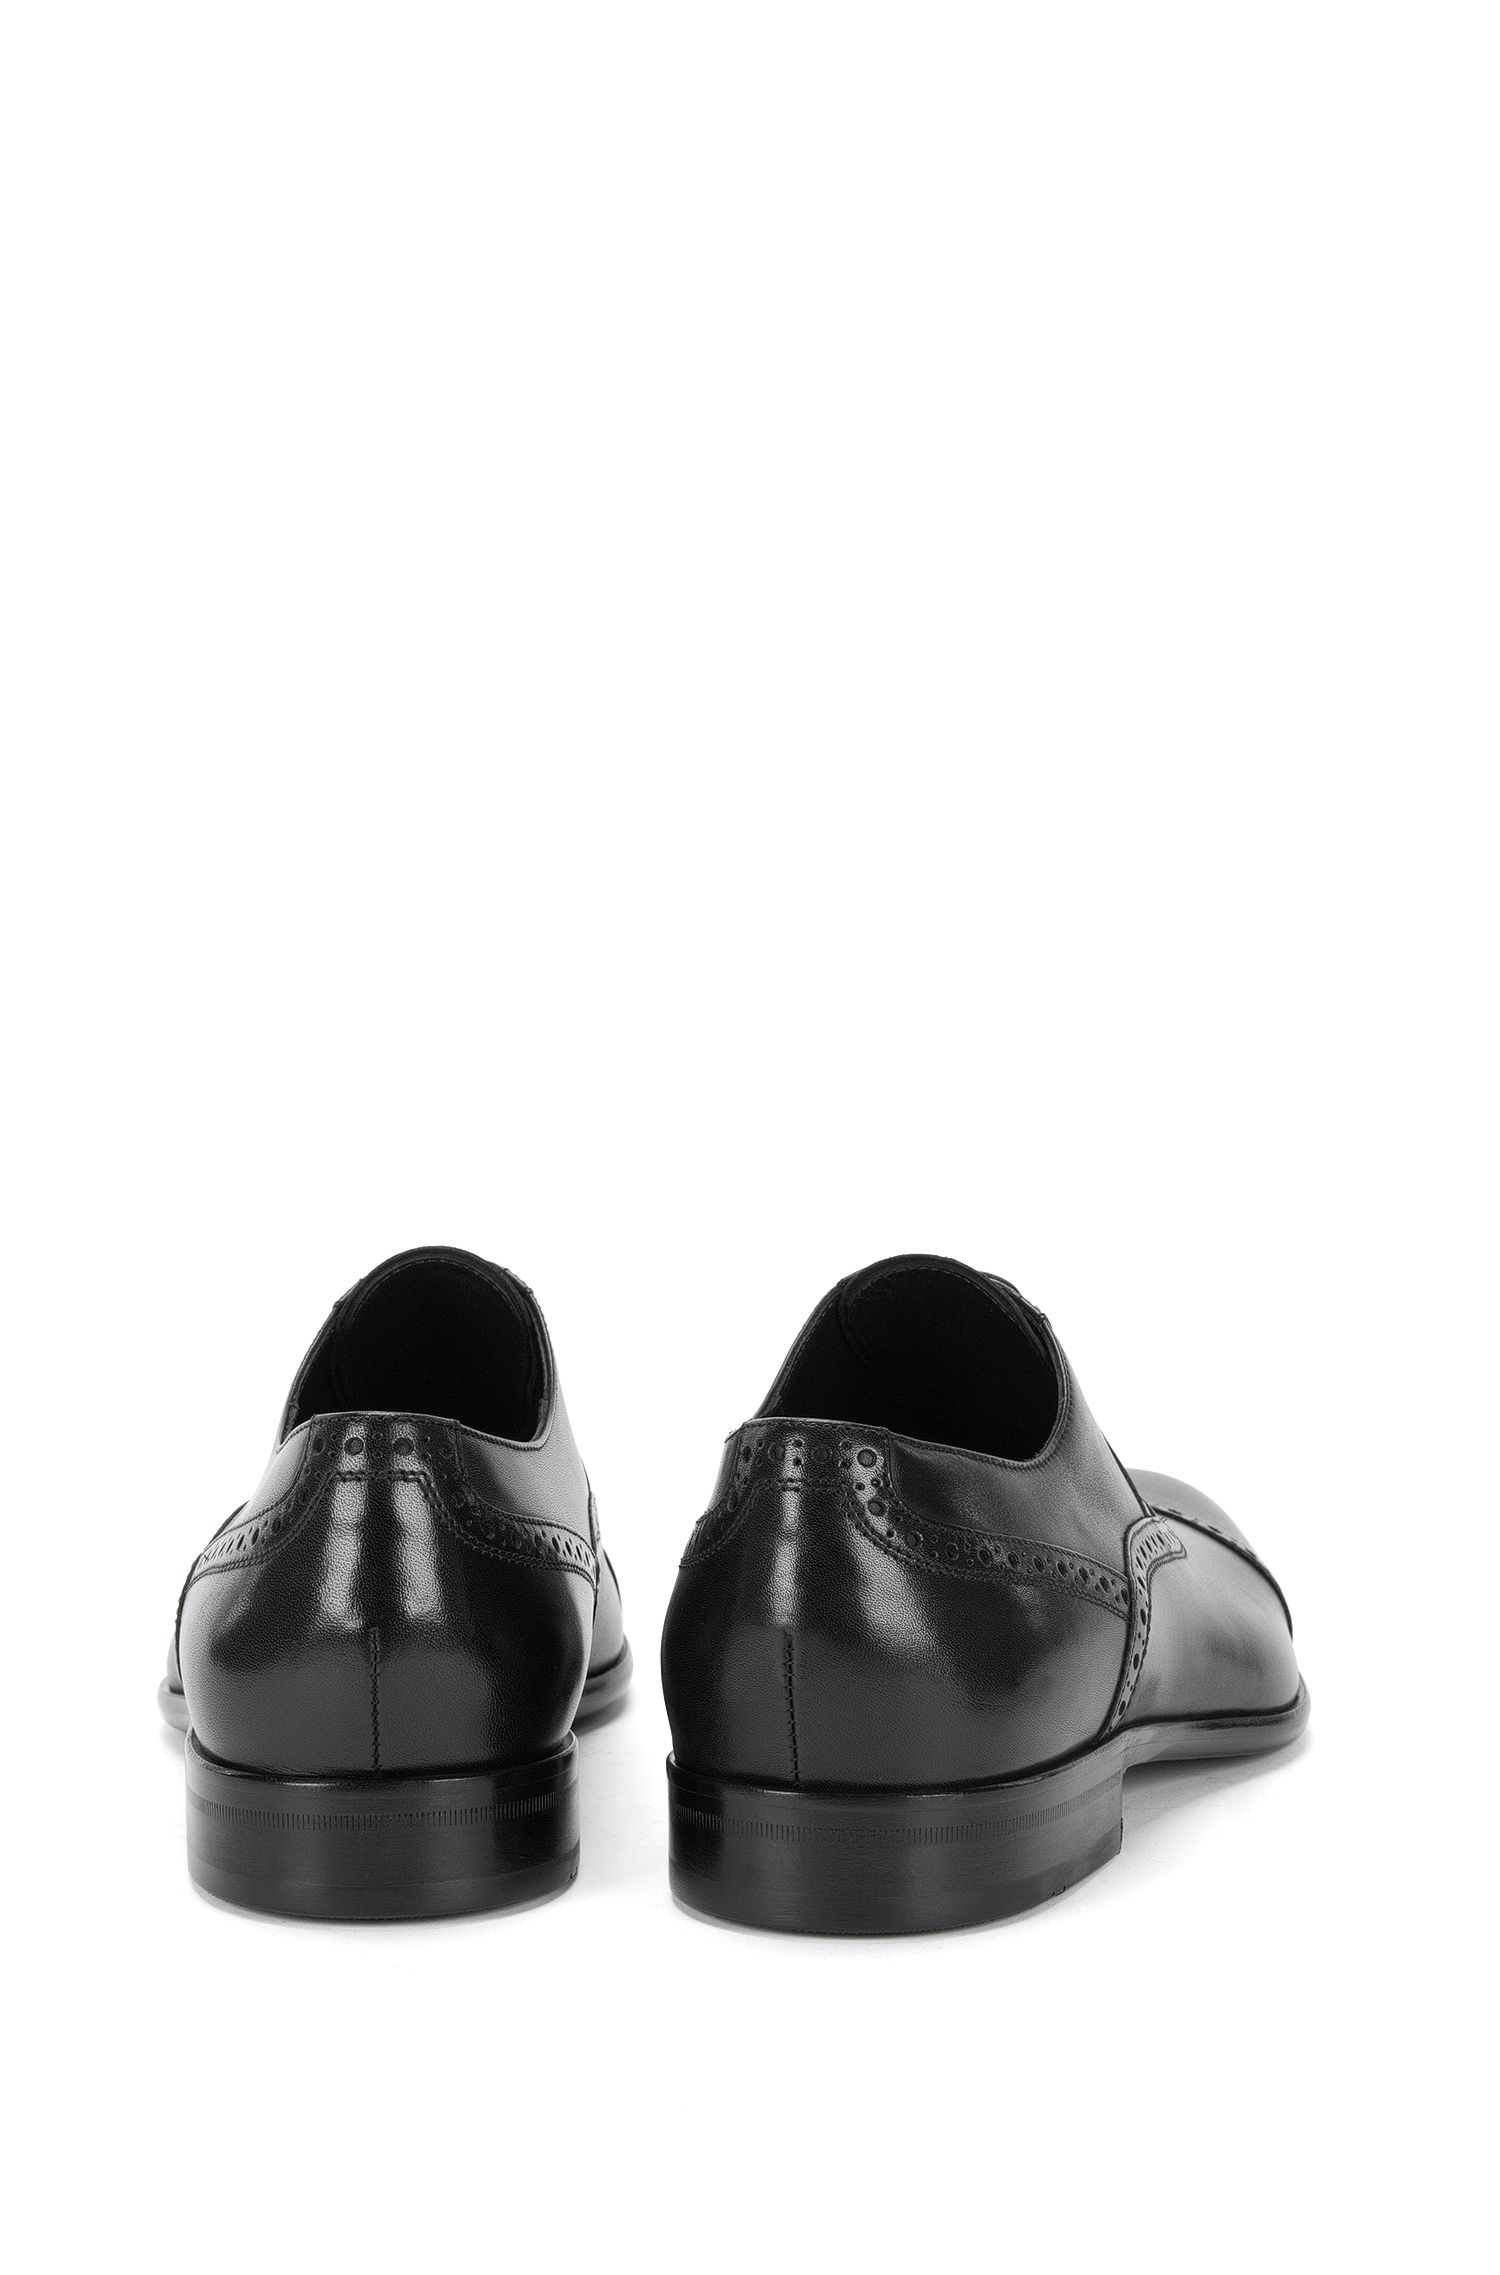 Schnürschuhe aus Leder im Budapester-Stil: 'Mannis'